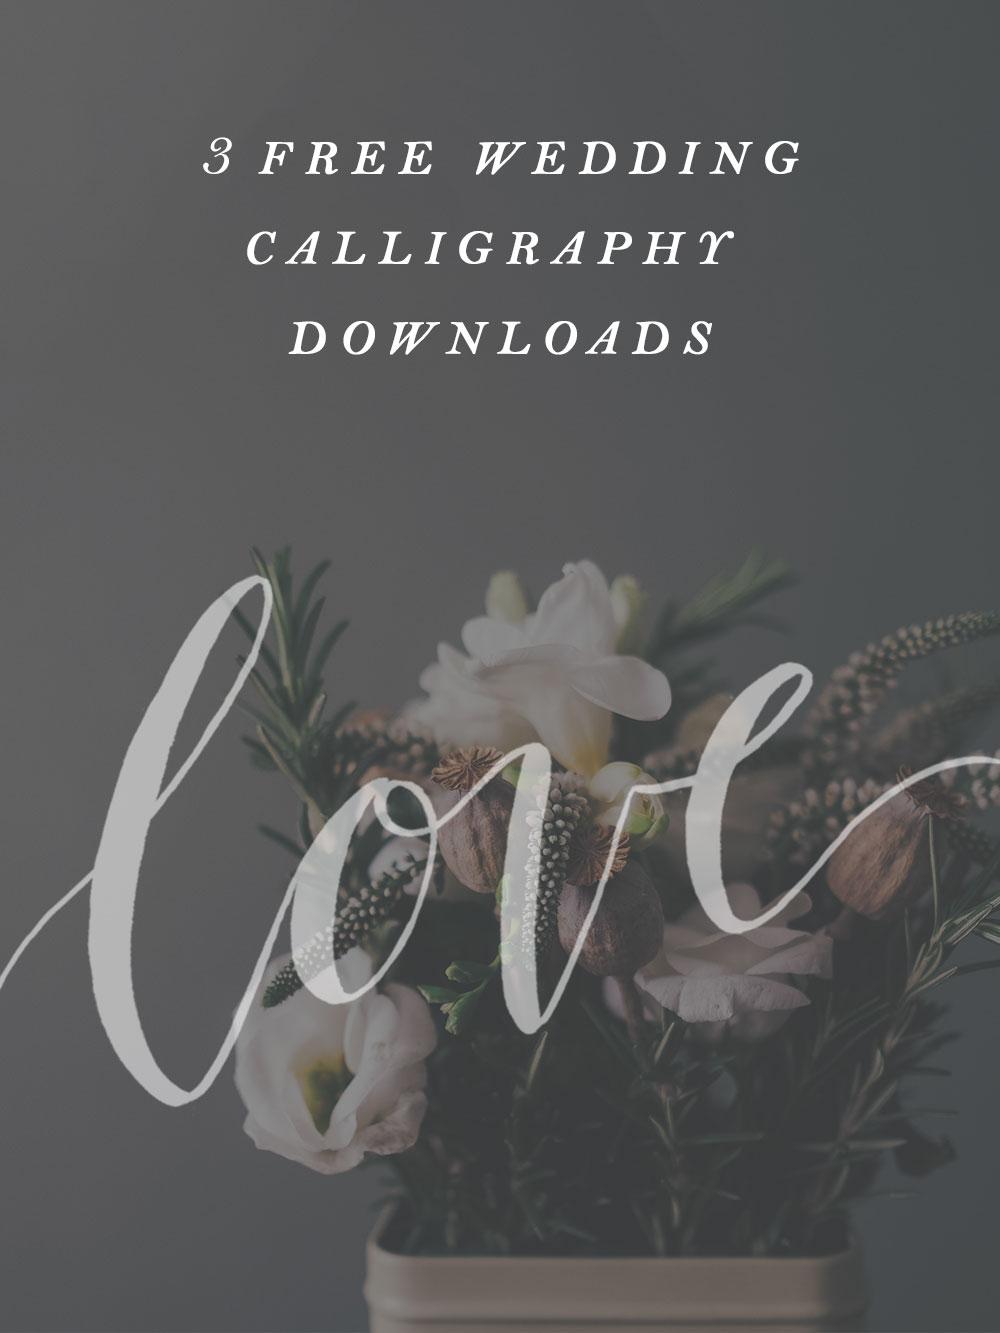 Owl Ink - 3 Free Wedding Calligraphy Downloads